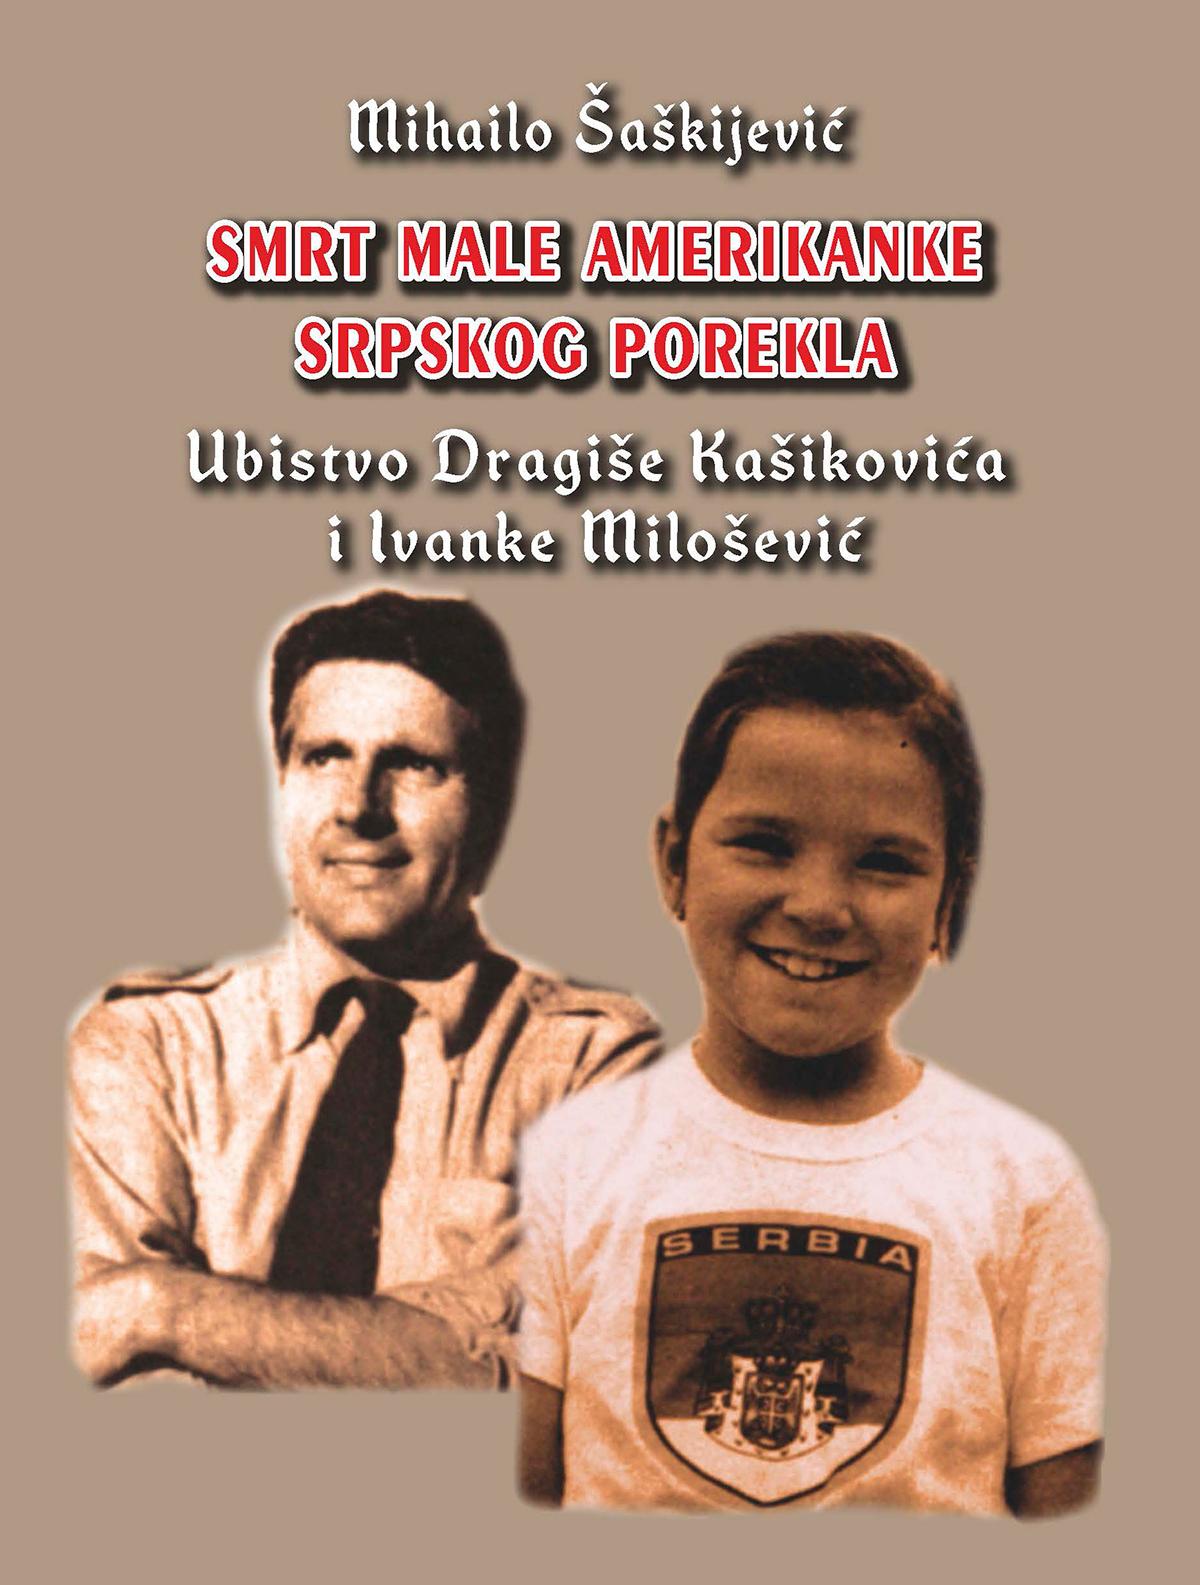 Смрт мале Американке српског порекла